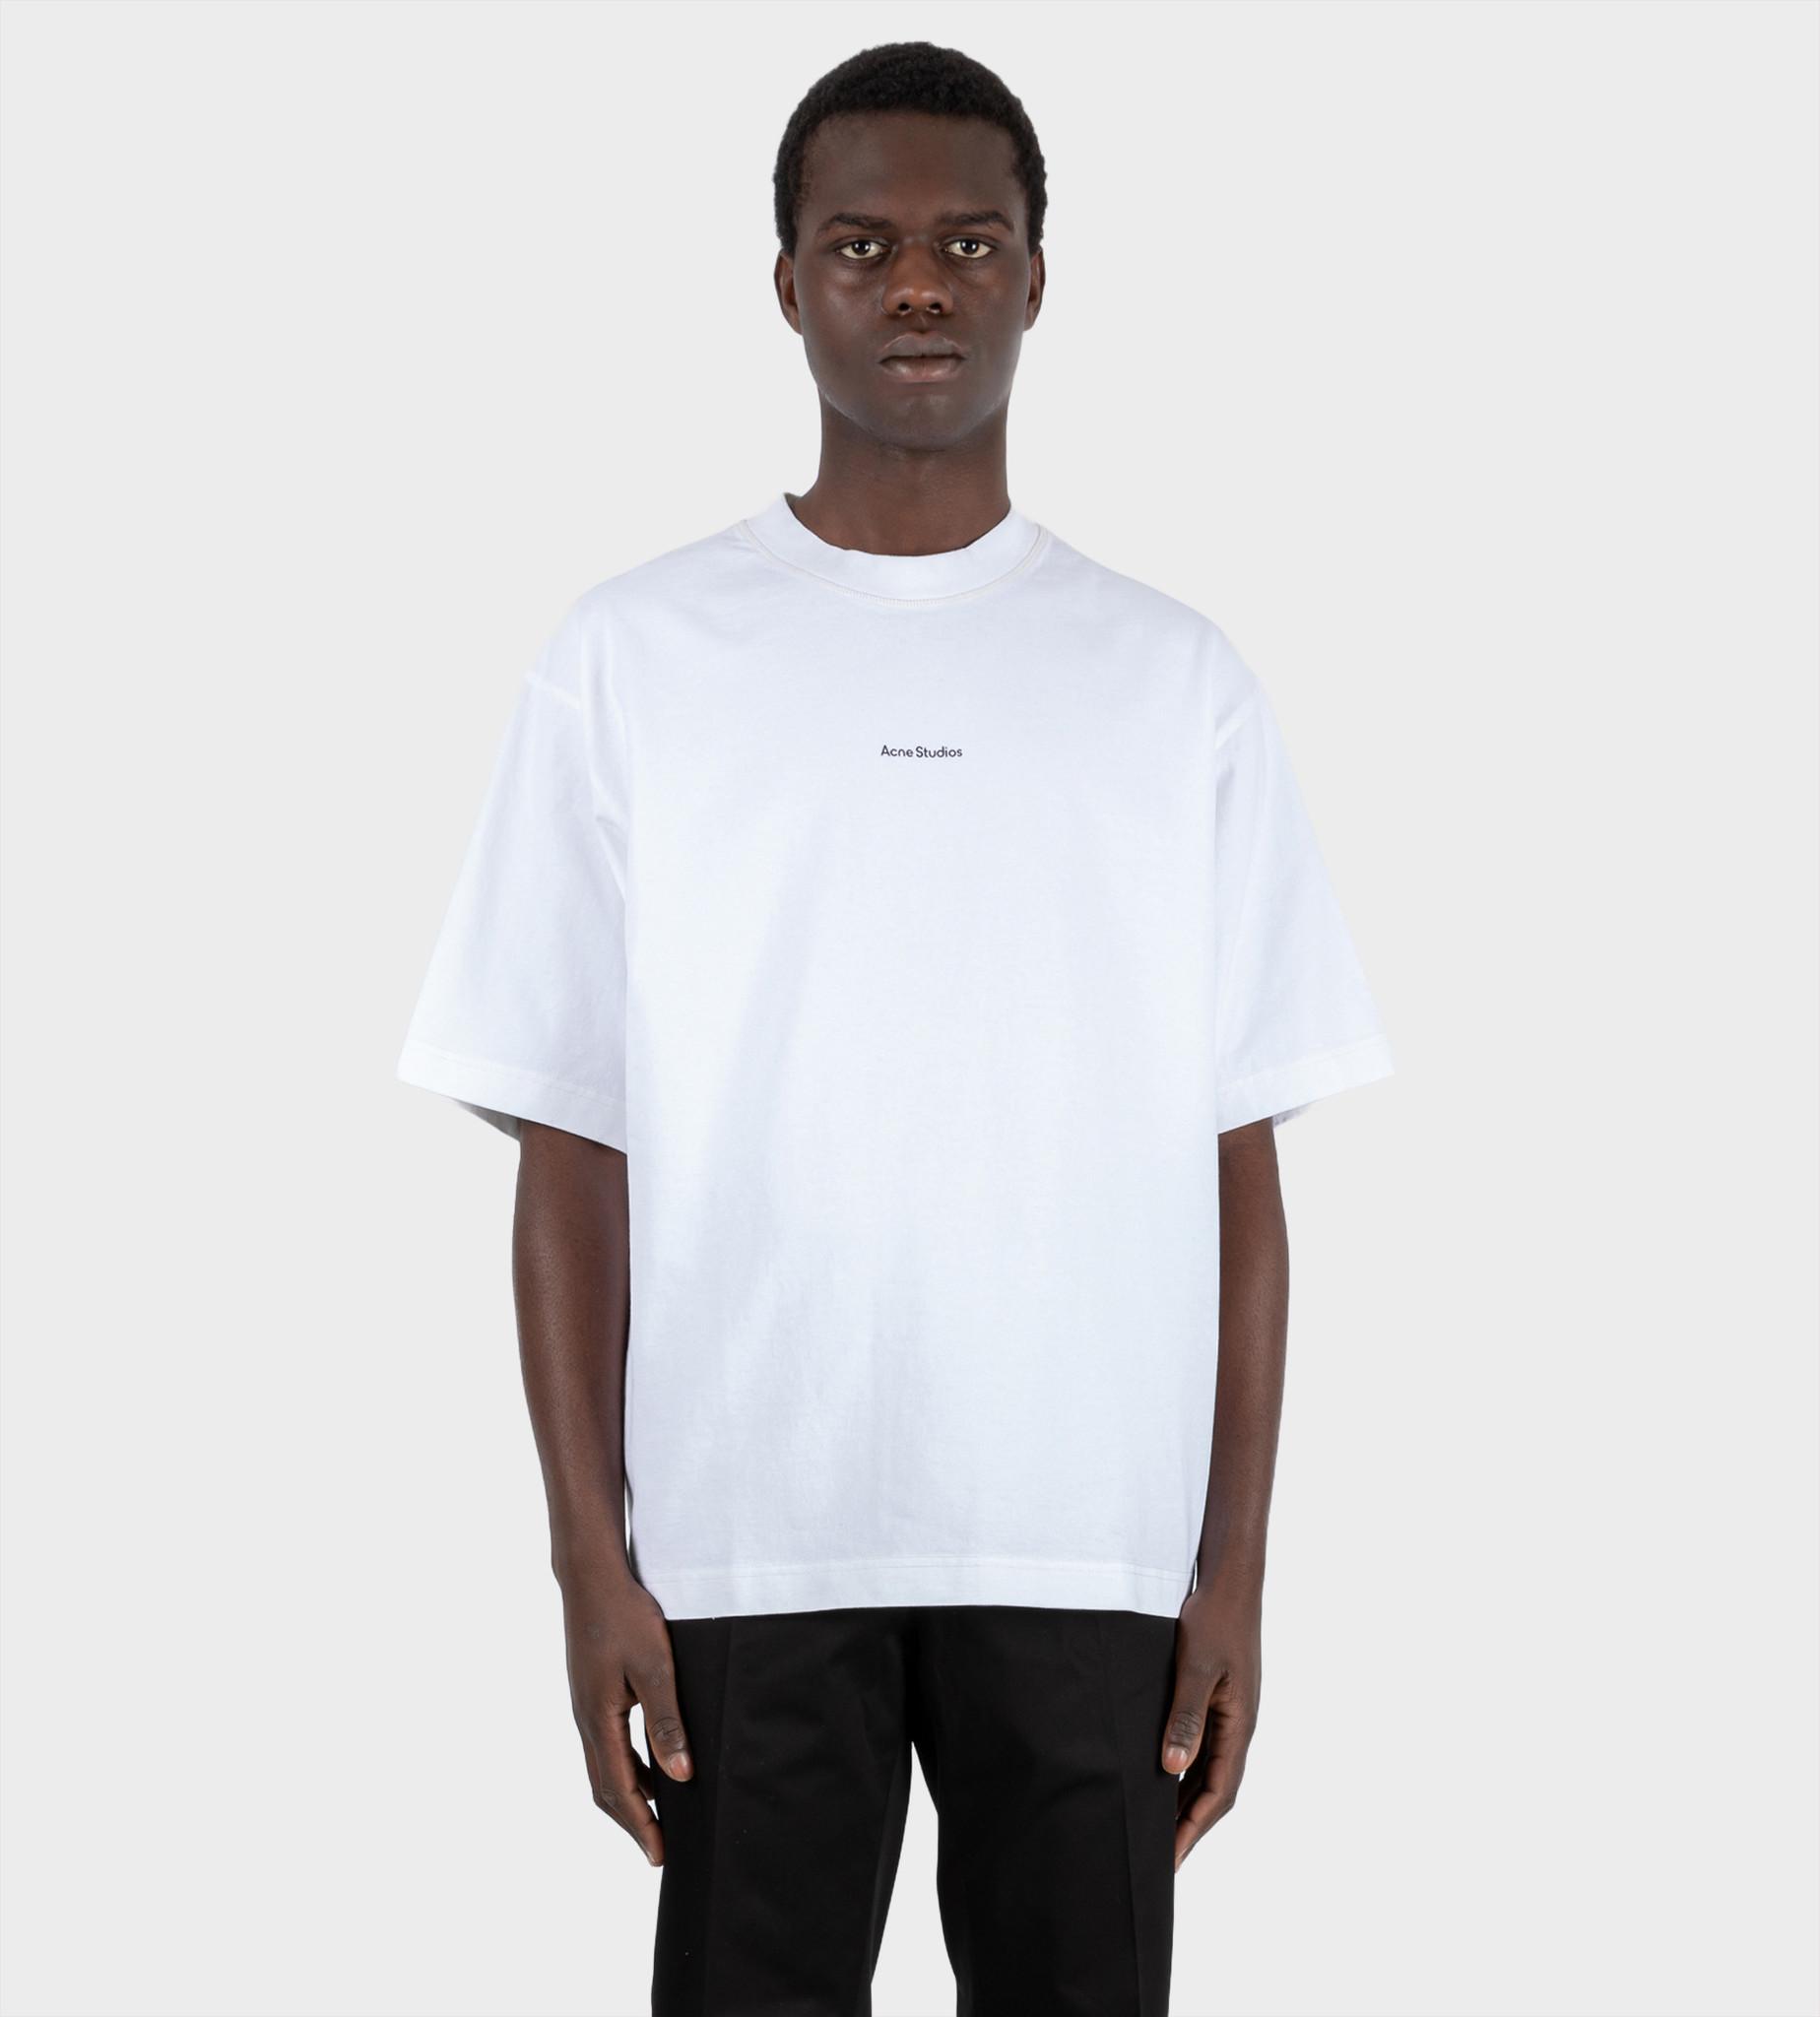 ACNE STUDIOS Logo Printed T-shirt  White